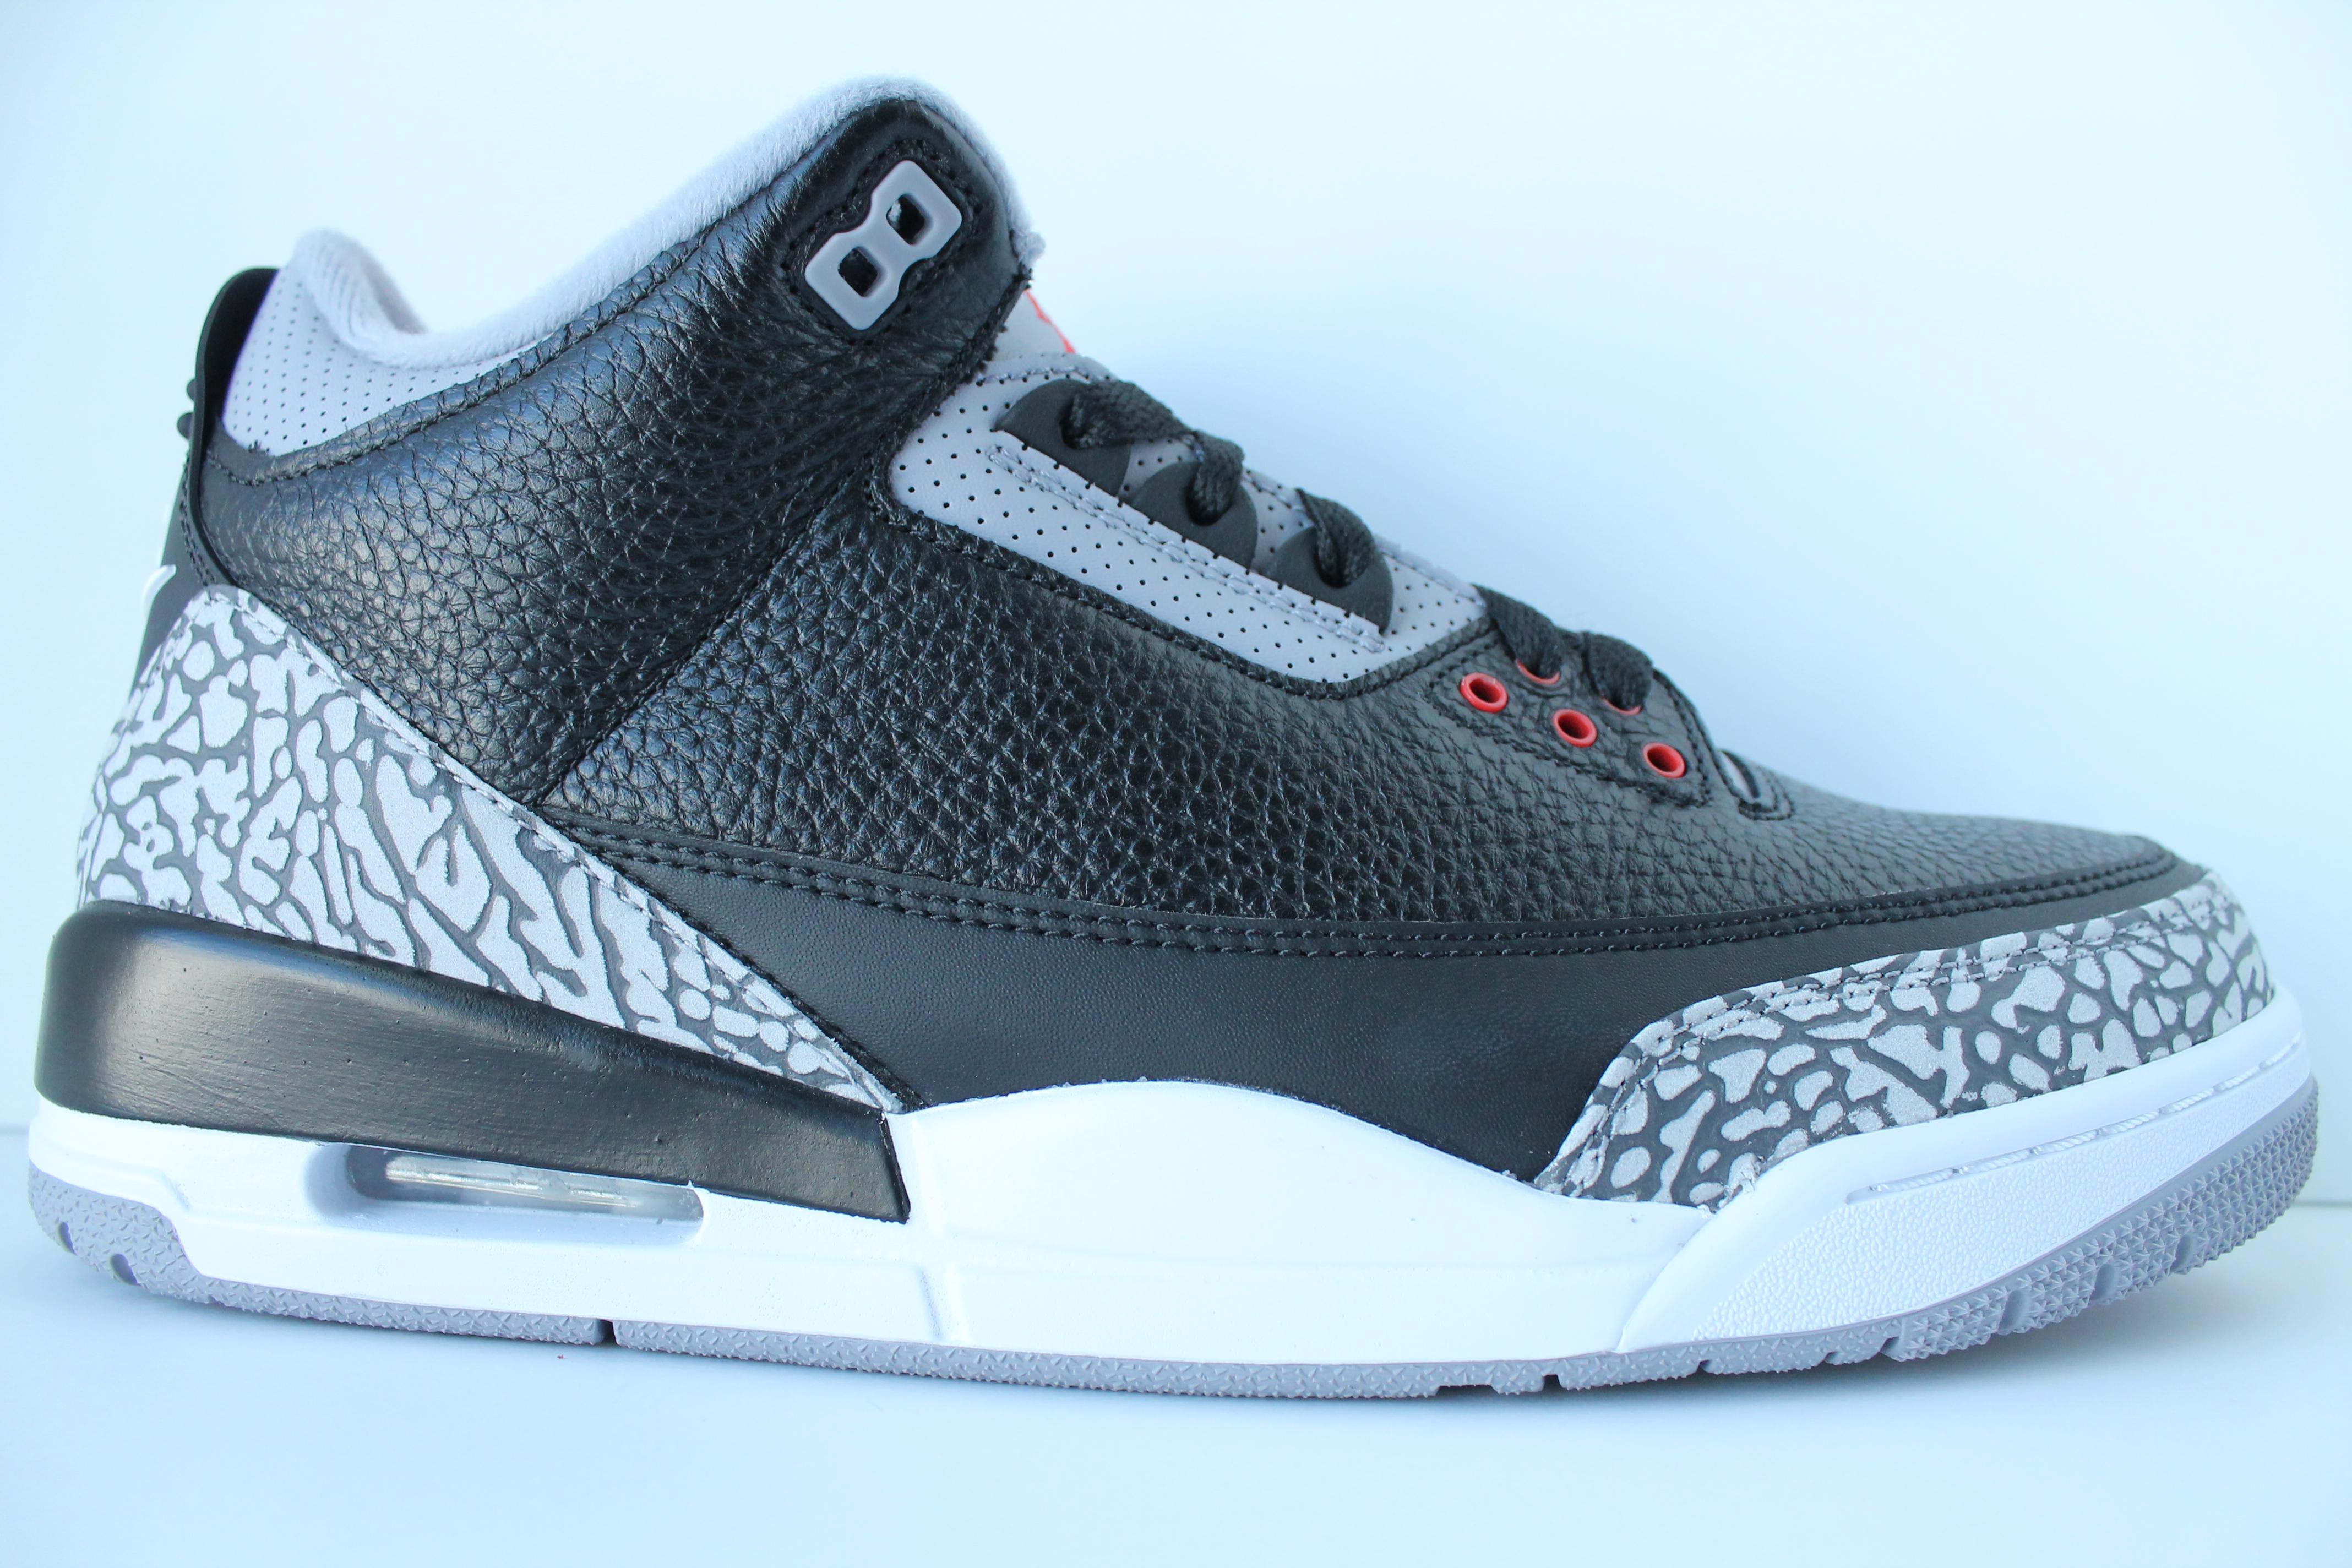 b427eb801d6 IMG_8878 · Air Jordan 3 Retro Black Cement ...